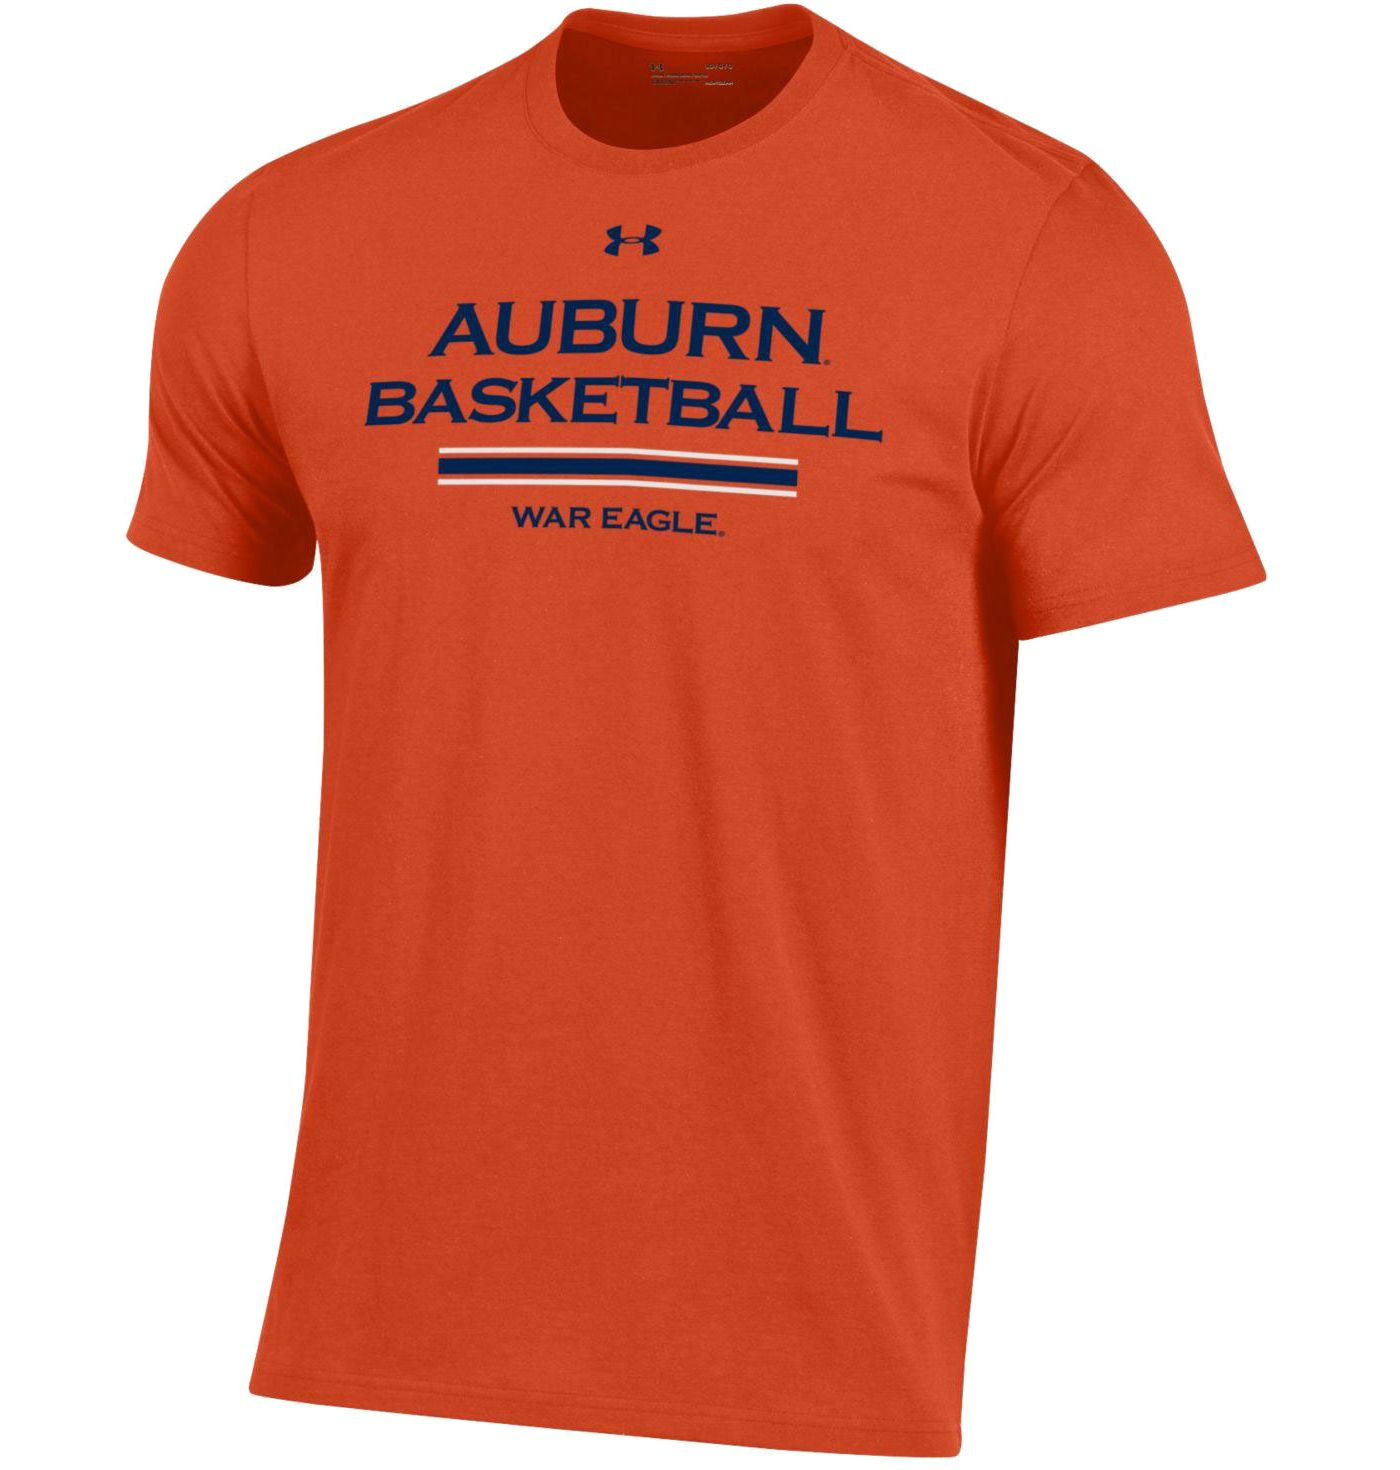 Under Armour Men's Auburn Tigers Orange Performance Cotton On-Court Basketball T-Shirt